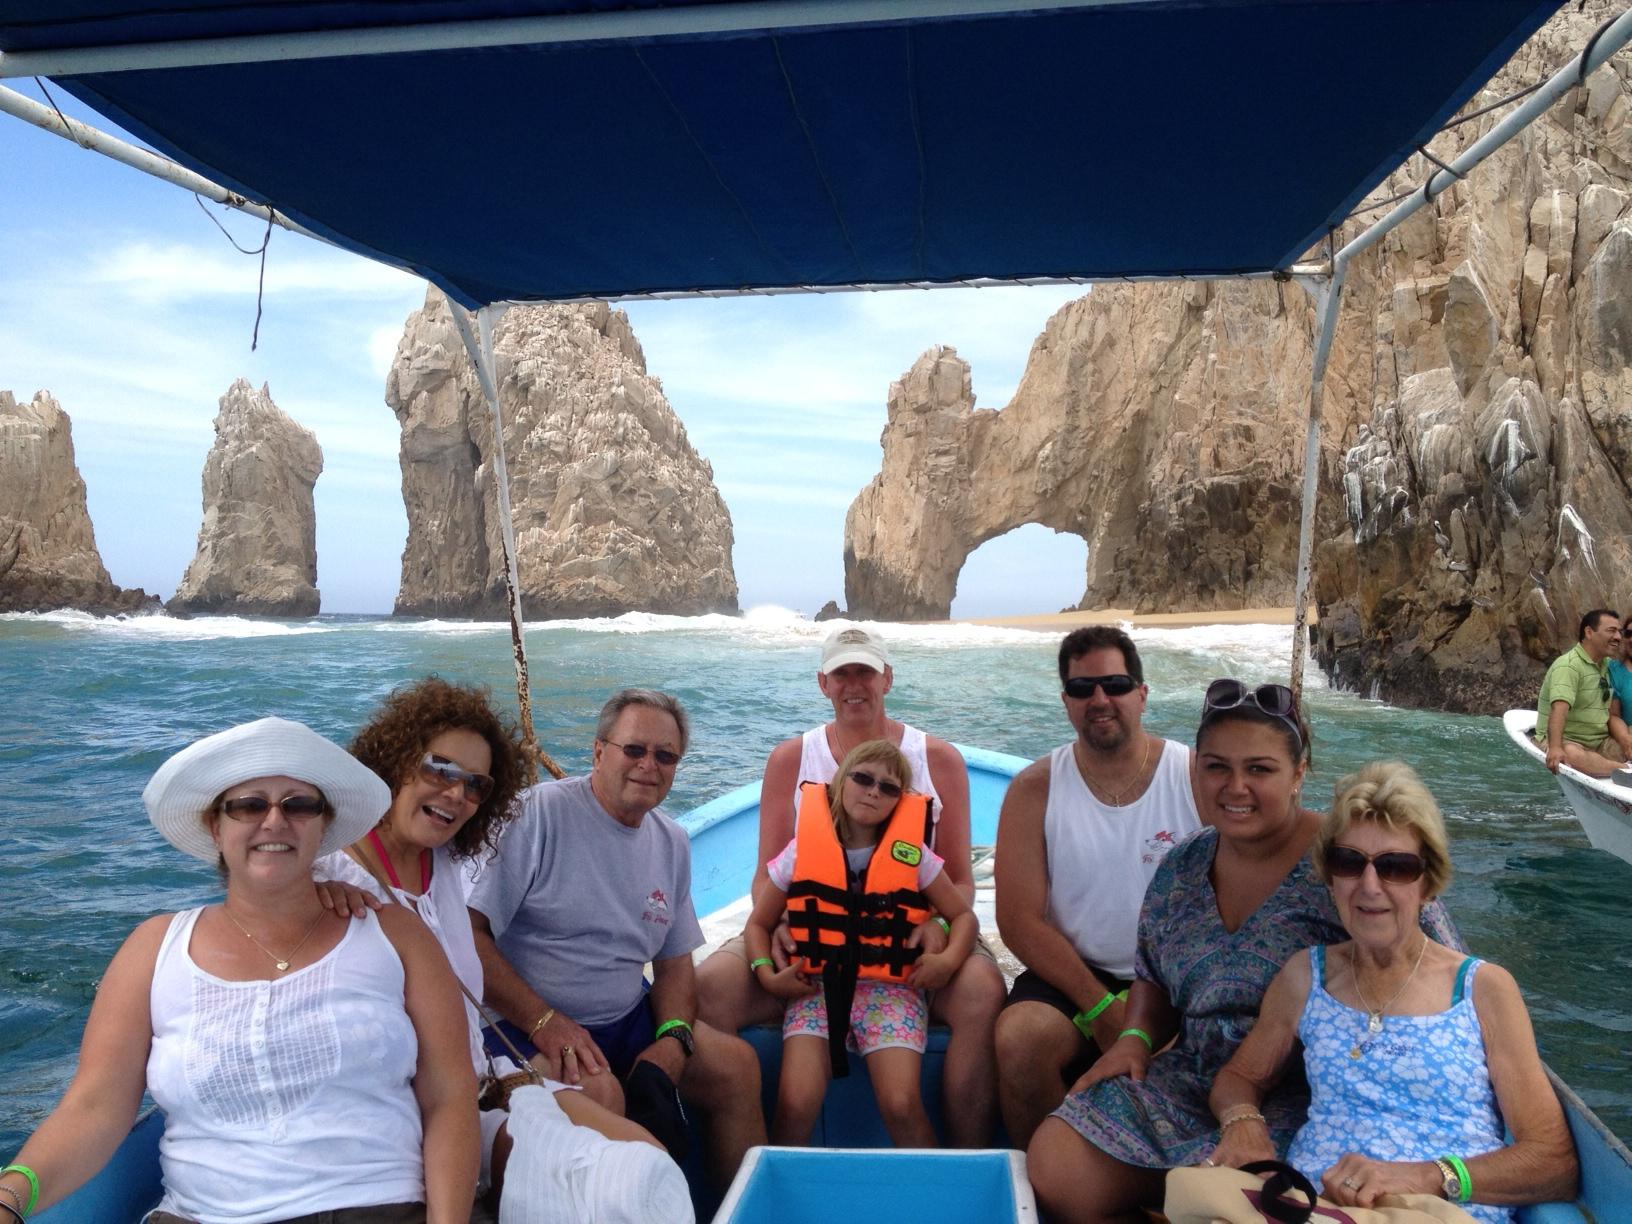 Fox family at Cabos San Lucas